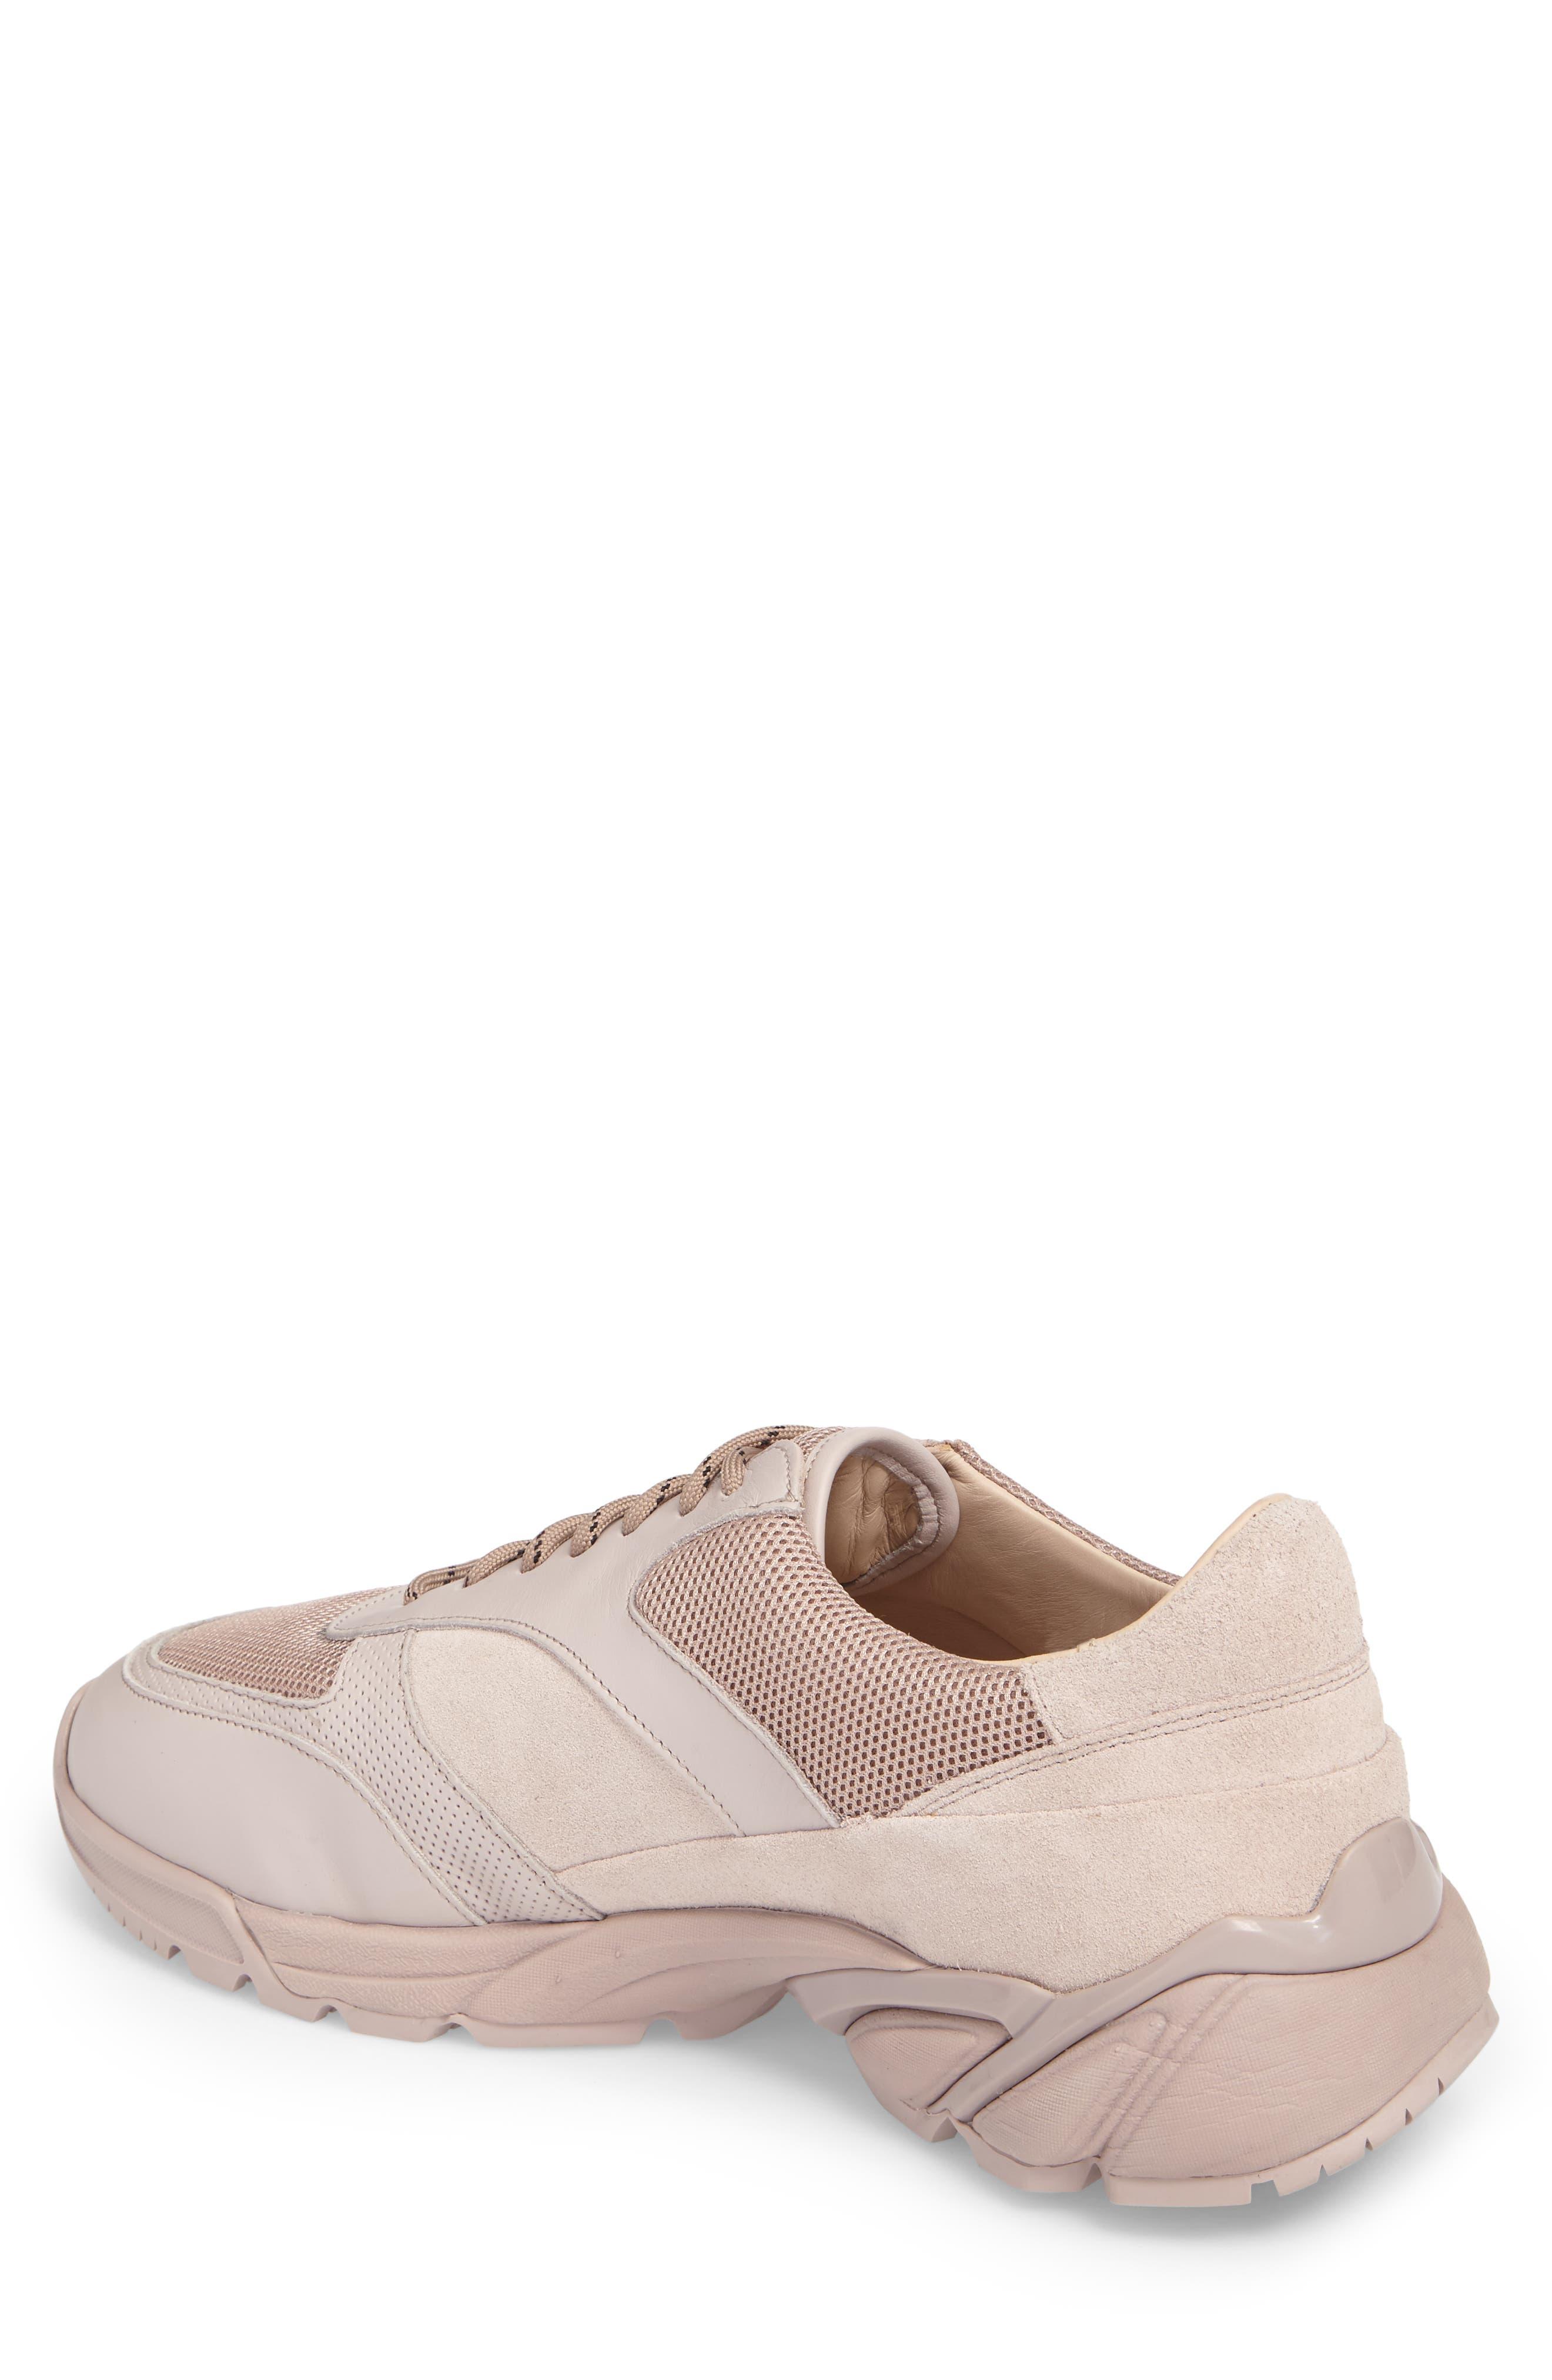 Tech Sneaker,                             Alternate thumbnail 2, color,                             Pale Lilac